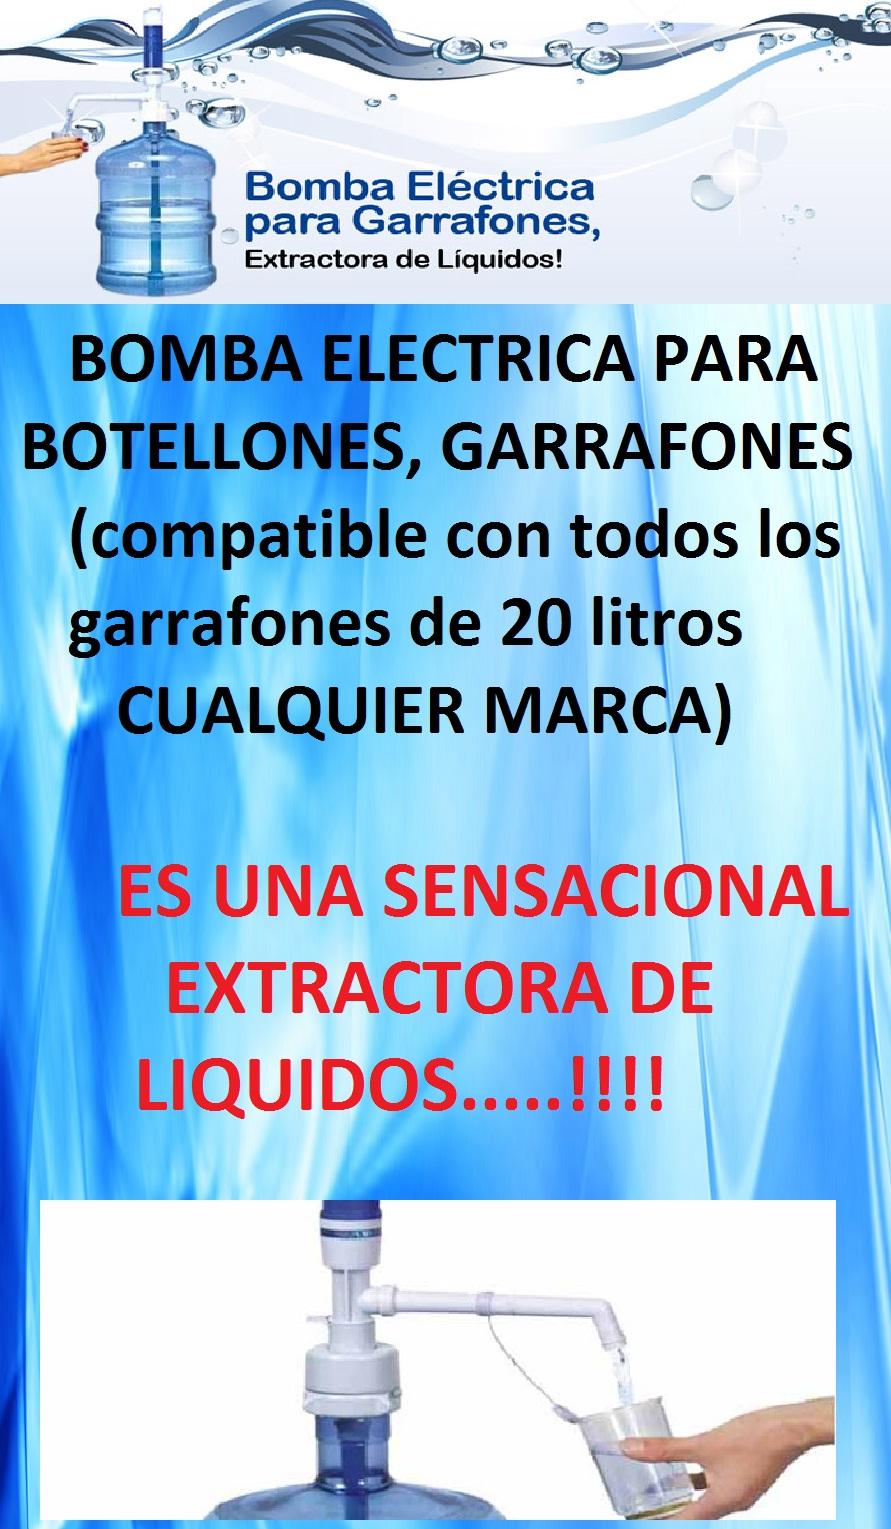 Bomba de agua electrica para garrafon el mejor precio maa - Bombas de agua electricas precios ...